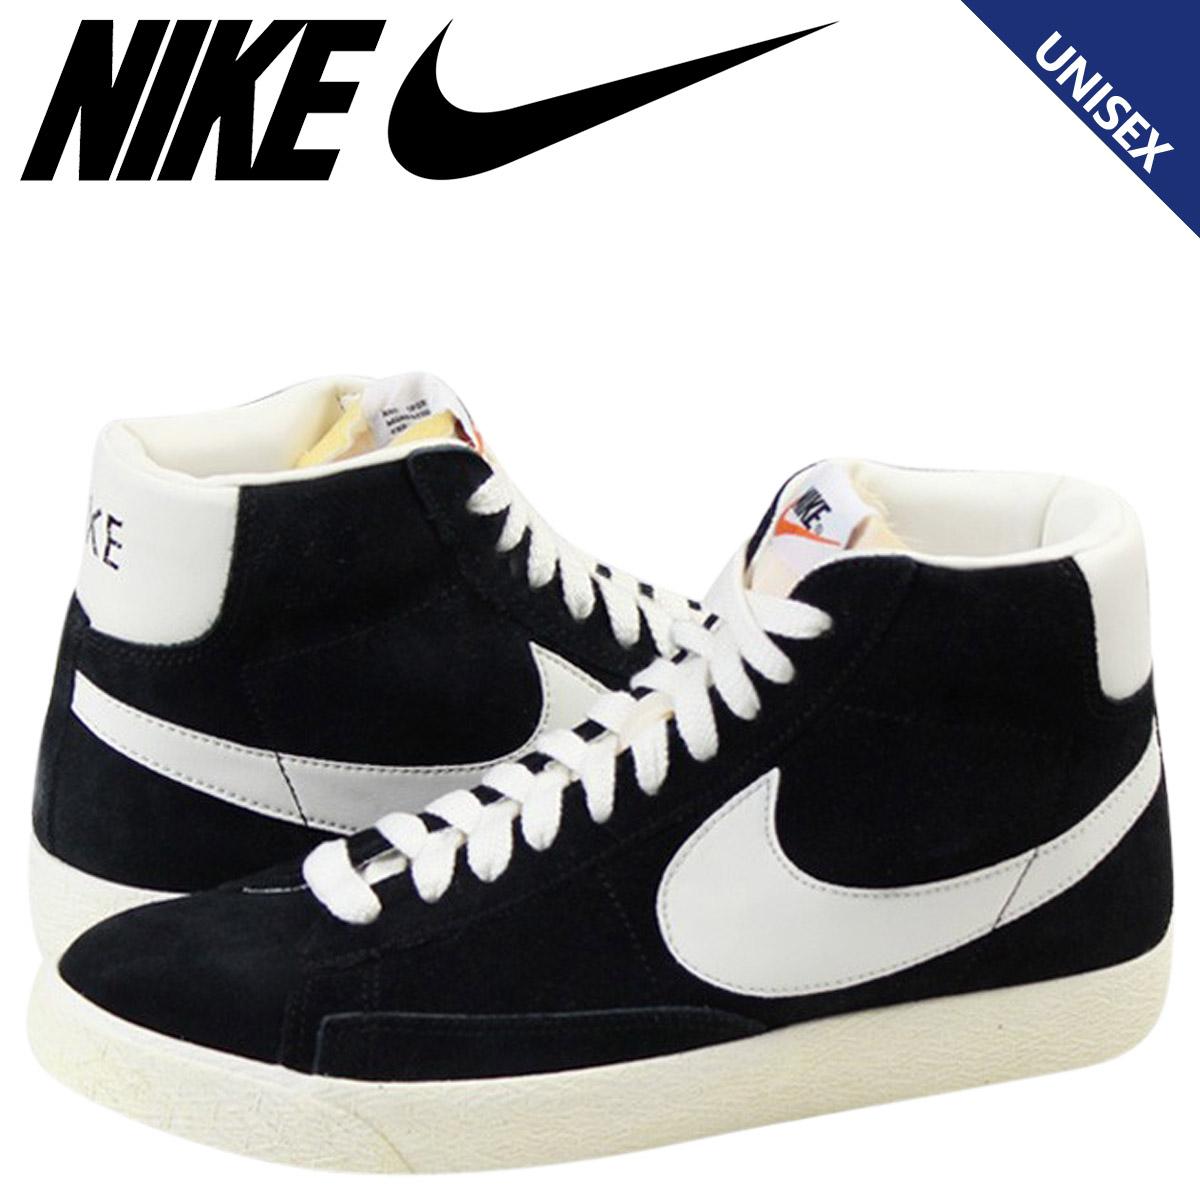 Vintage Suede Unisex Cloth 375 722 Gap Blazer High Loads 001 Shinnyu Nike Sneakers Men Dis Black121 Ybyf76g